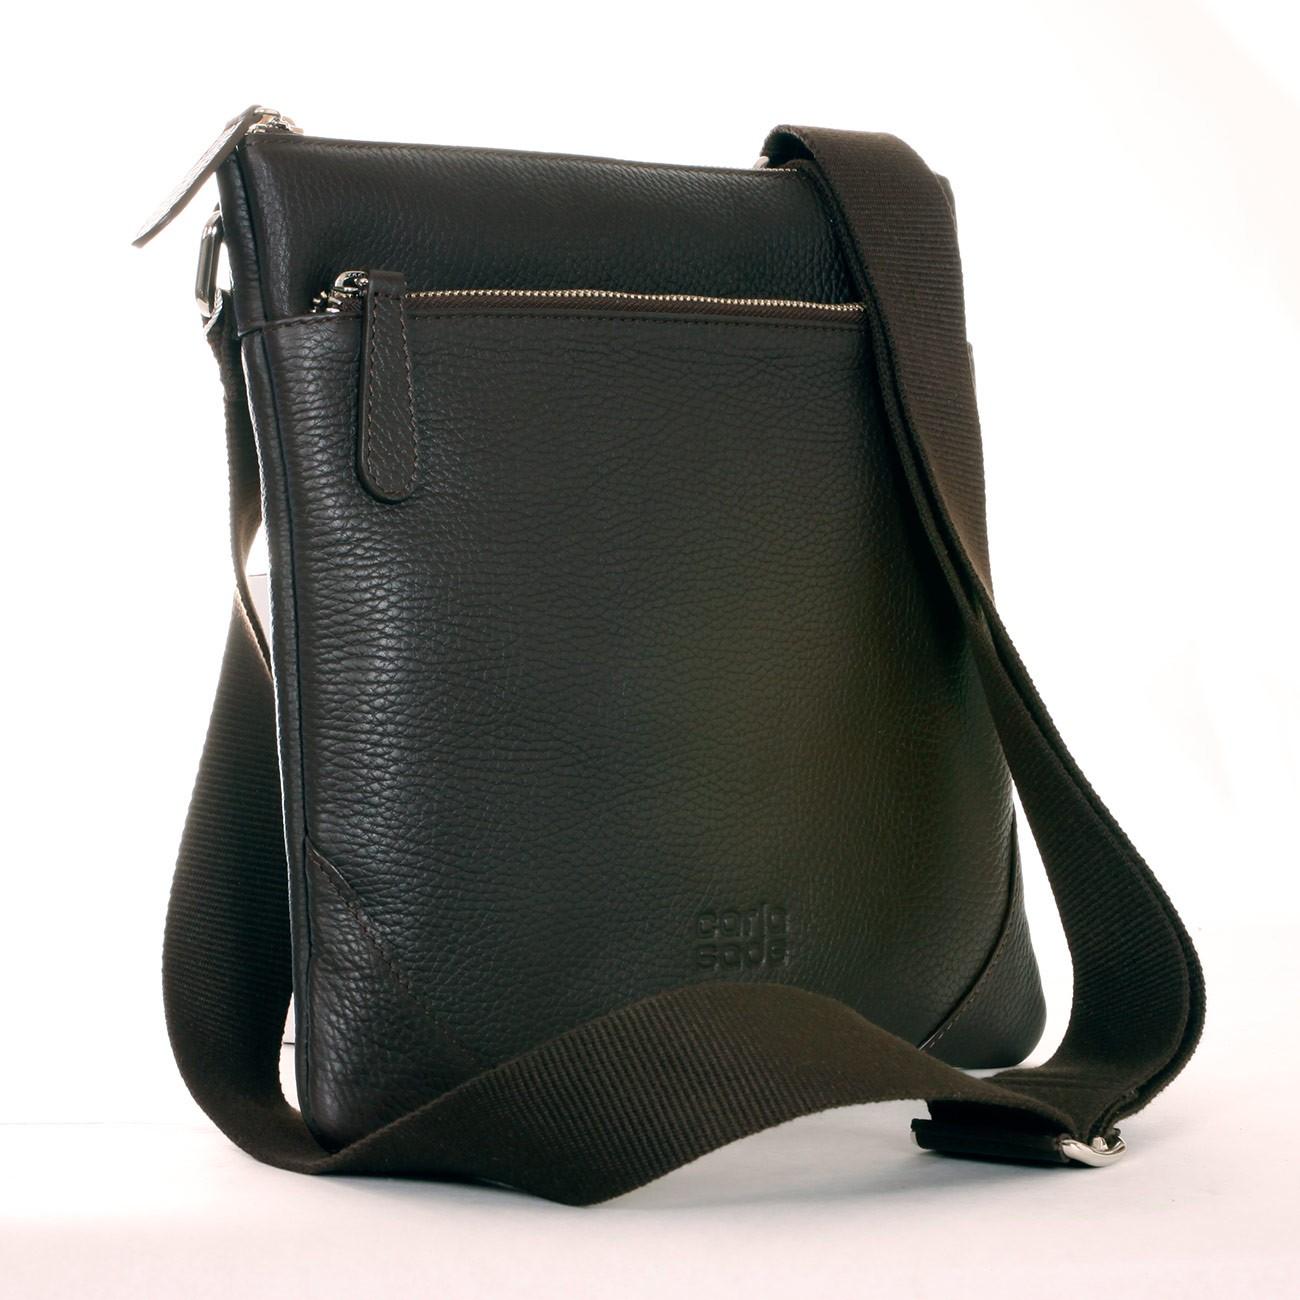 de bolsa bandolera bandolera cuero bolsa bandolera bolsa de de cuero cuero bandolera bolsa de xSIqPwP6